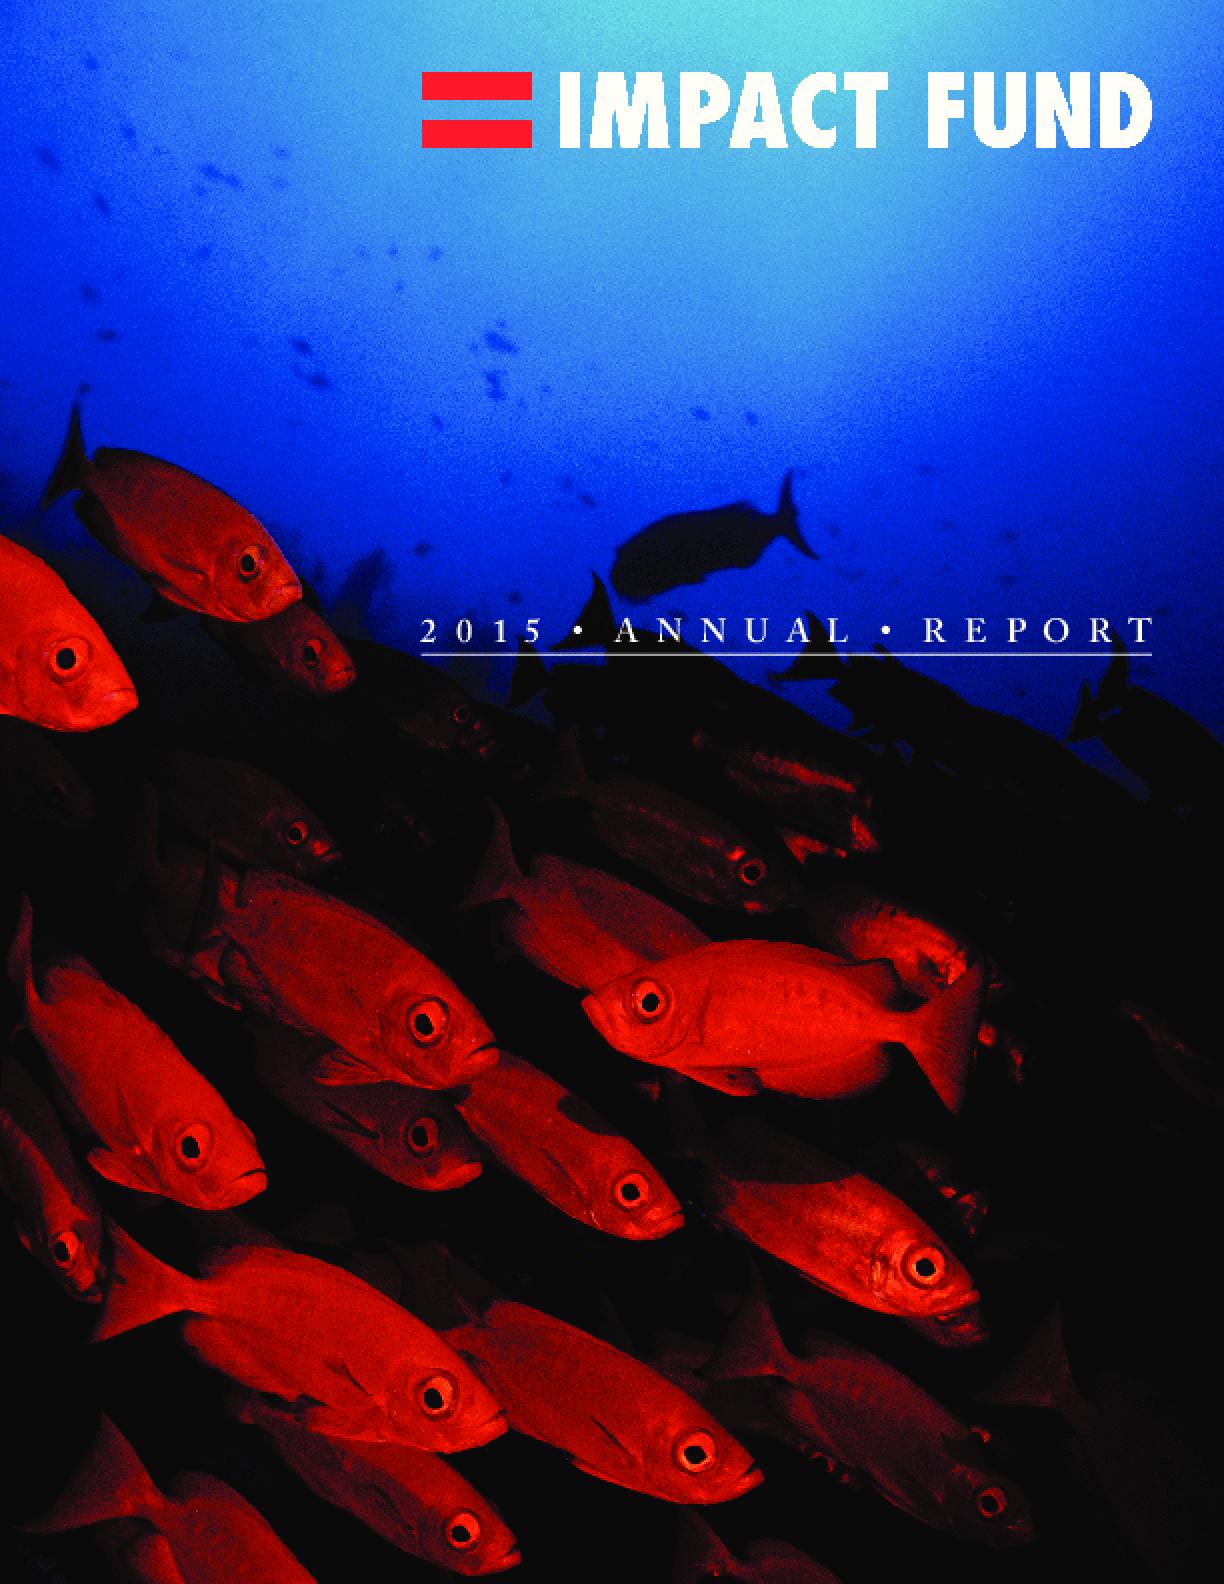 Impact Fund 2015 Annual Report